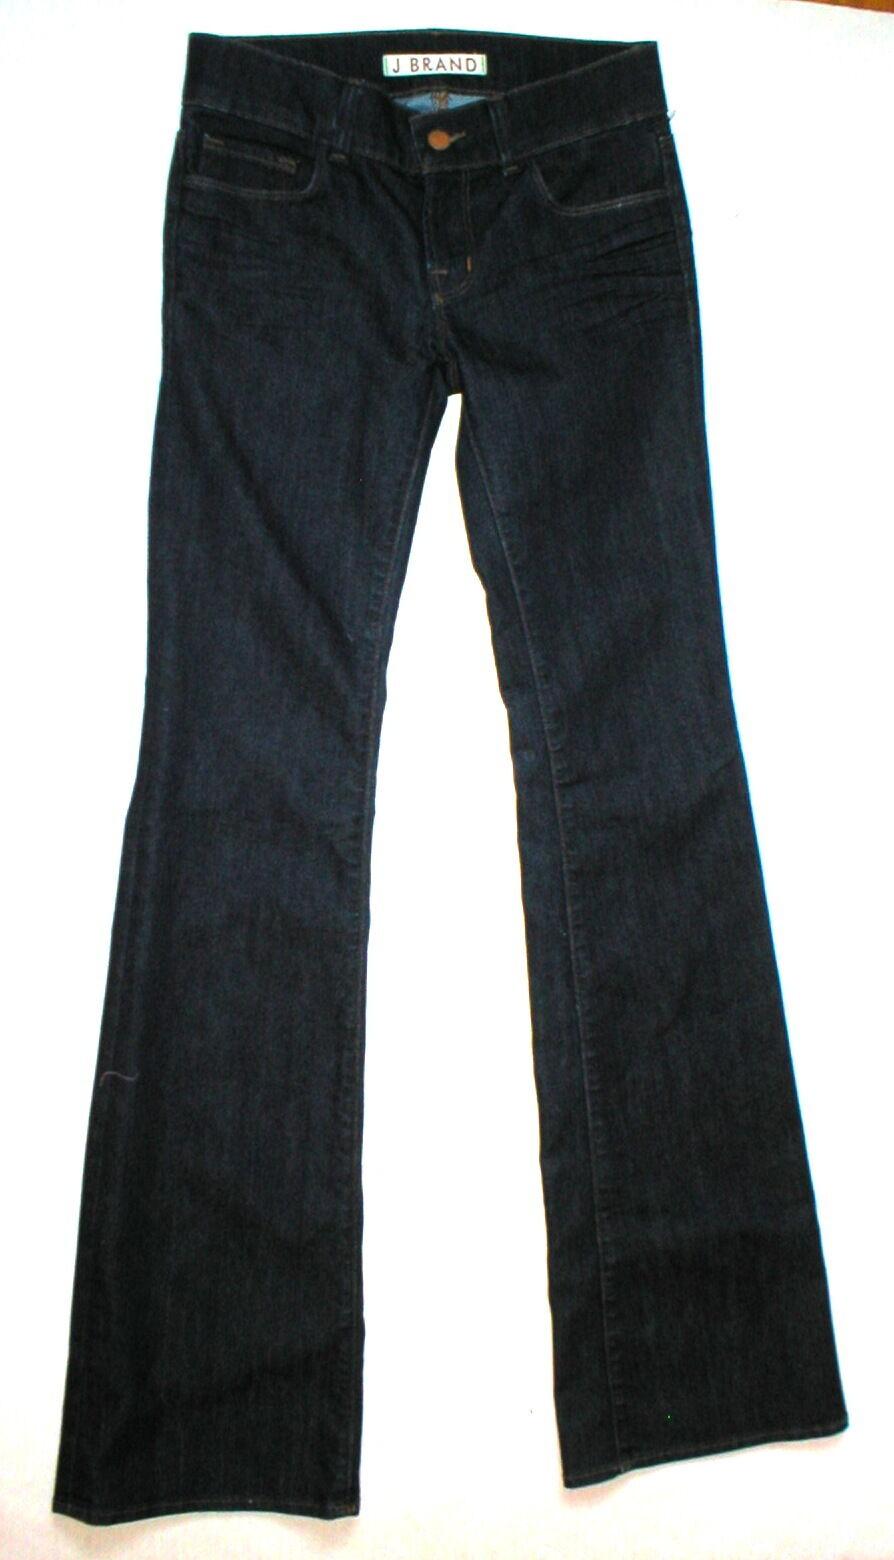 Nouveau Designer J Brand Jeans très Foncé Flare 25 Femme 34.5 grande Größe basse